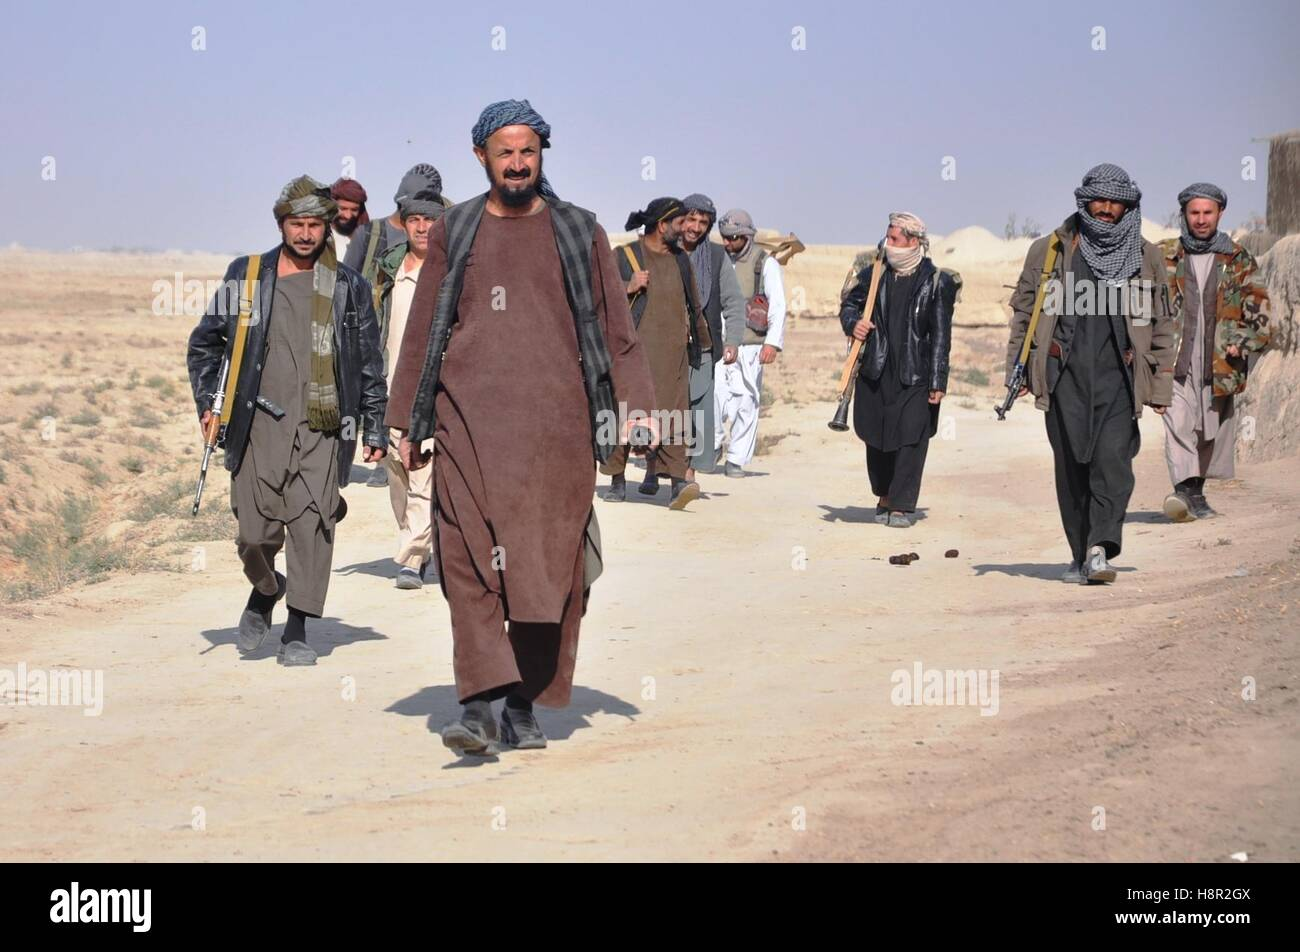 Jauzjan Afghanistan 15th Nov 2016 Pro Government Militants Take Part In An Uprising Against Taliban Militants In Faizabad District Of Jauzjan Province Afghanistan Nov 15 2016 Hundreds Of People Have Taken Up Arms